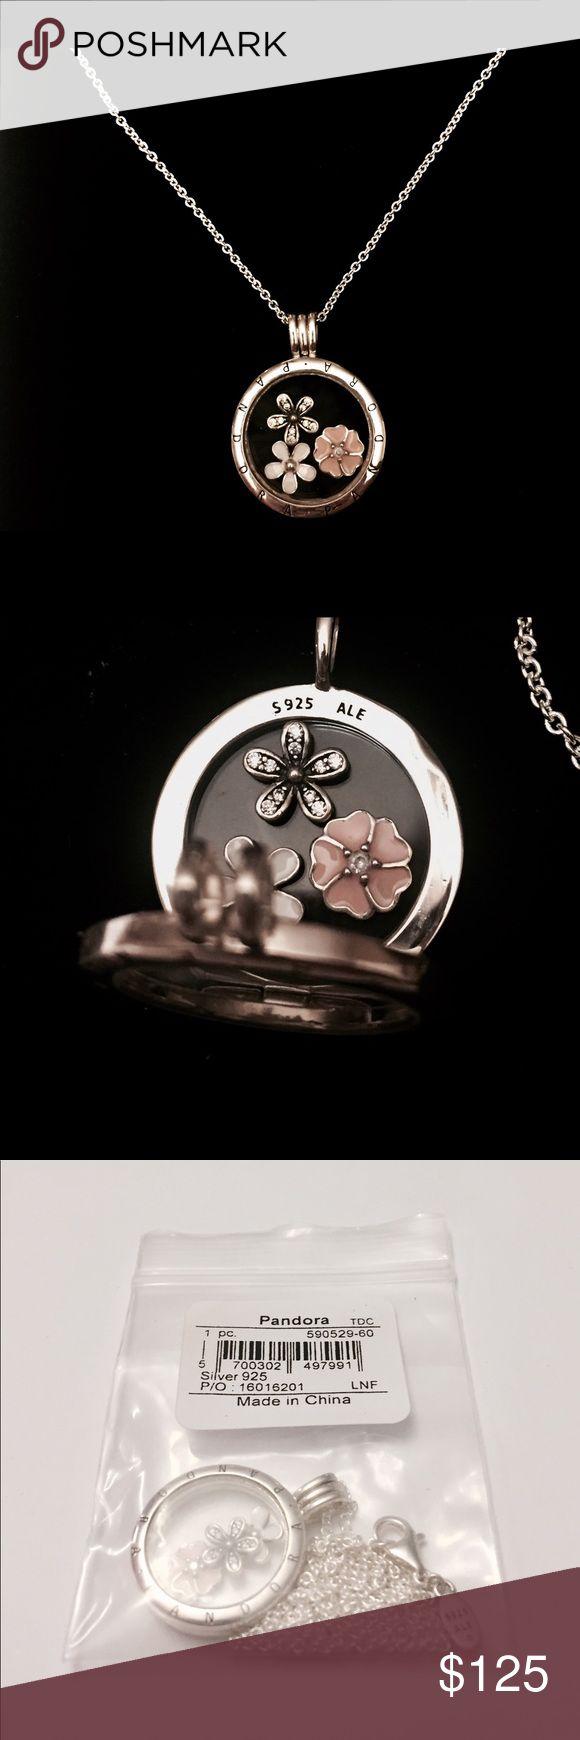 Pandora Floating Locket Necklace W/ Petites. The Necklace Comes with the Pandora Necklace Tag and the Pandora Hinged Necklace Box. Pandora Jewelry Necklaces